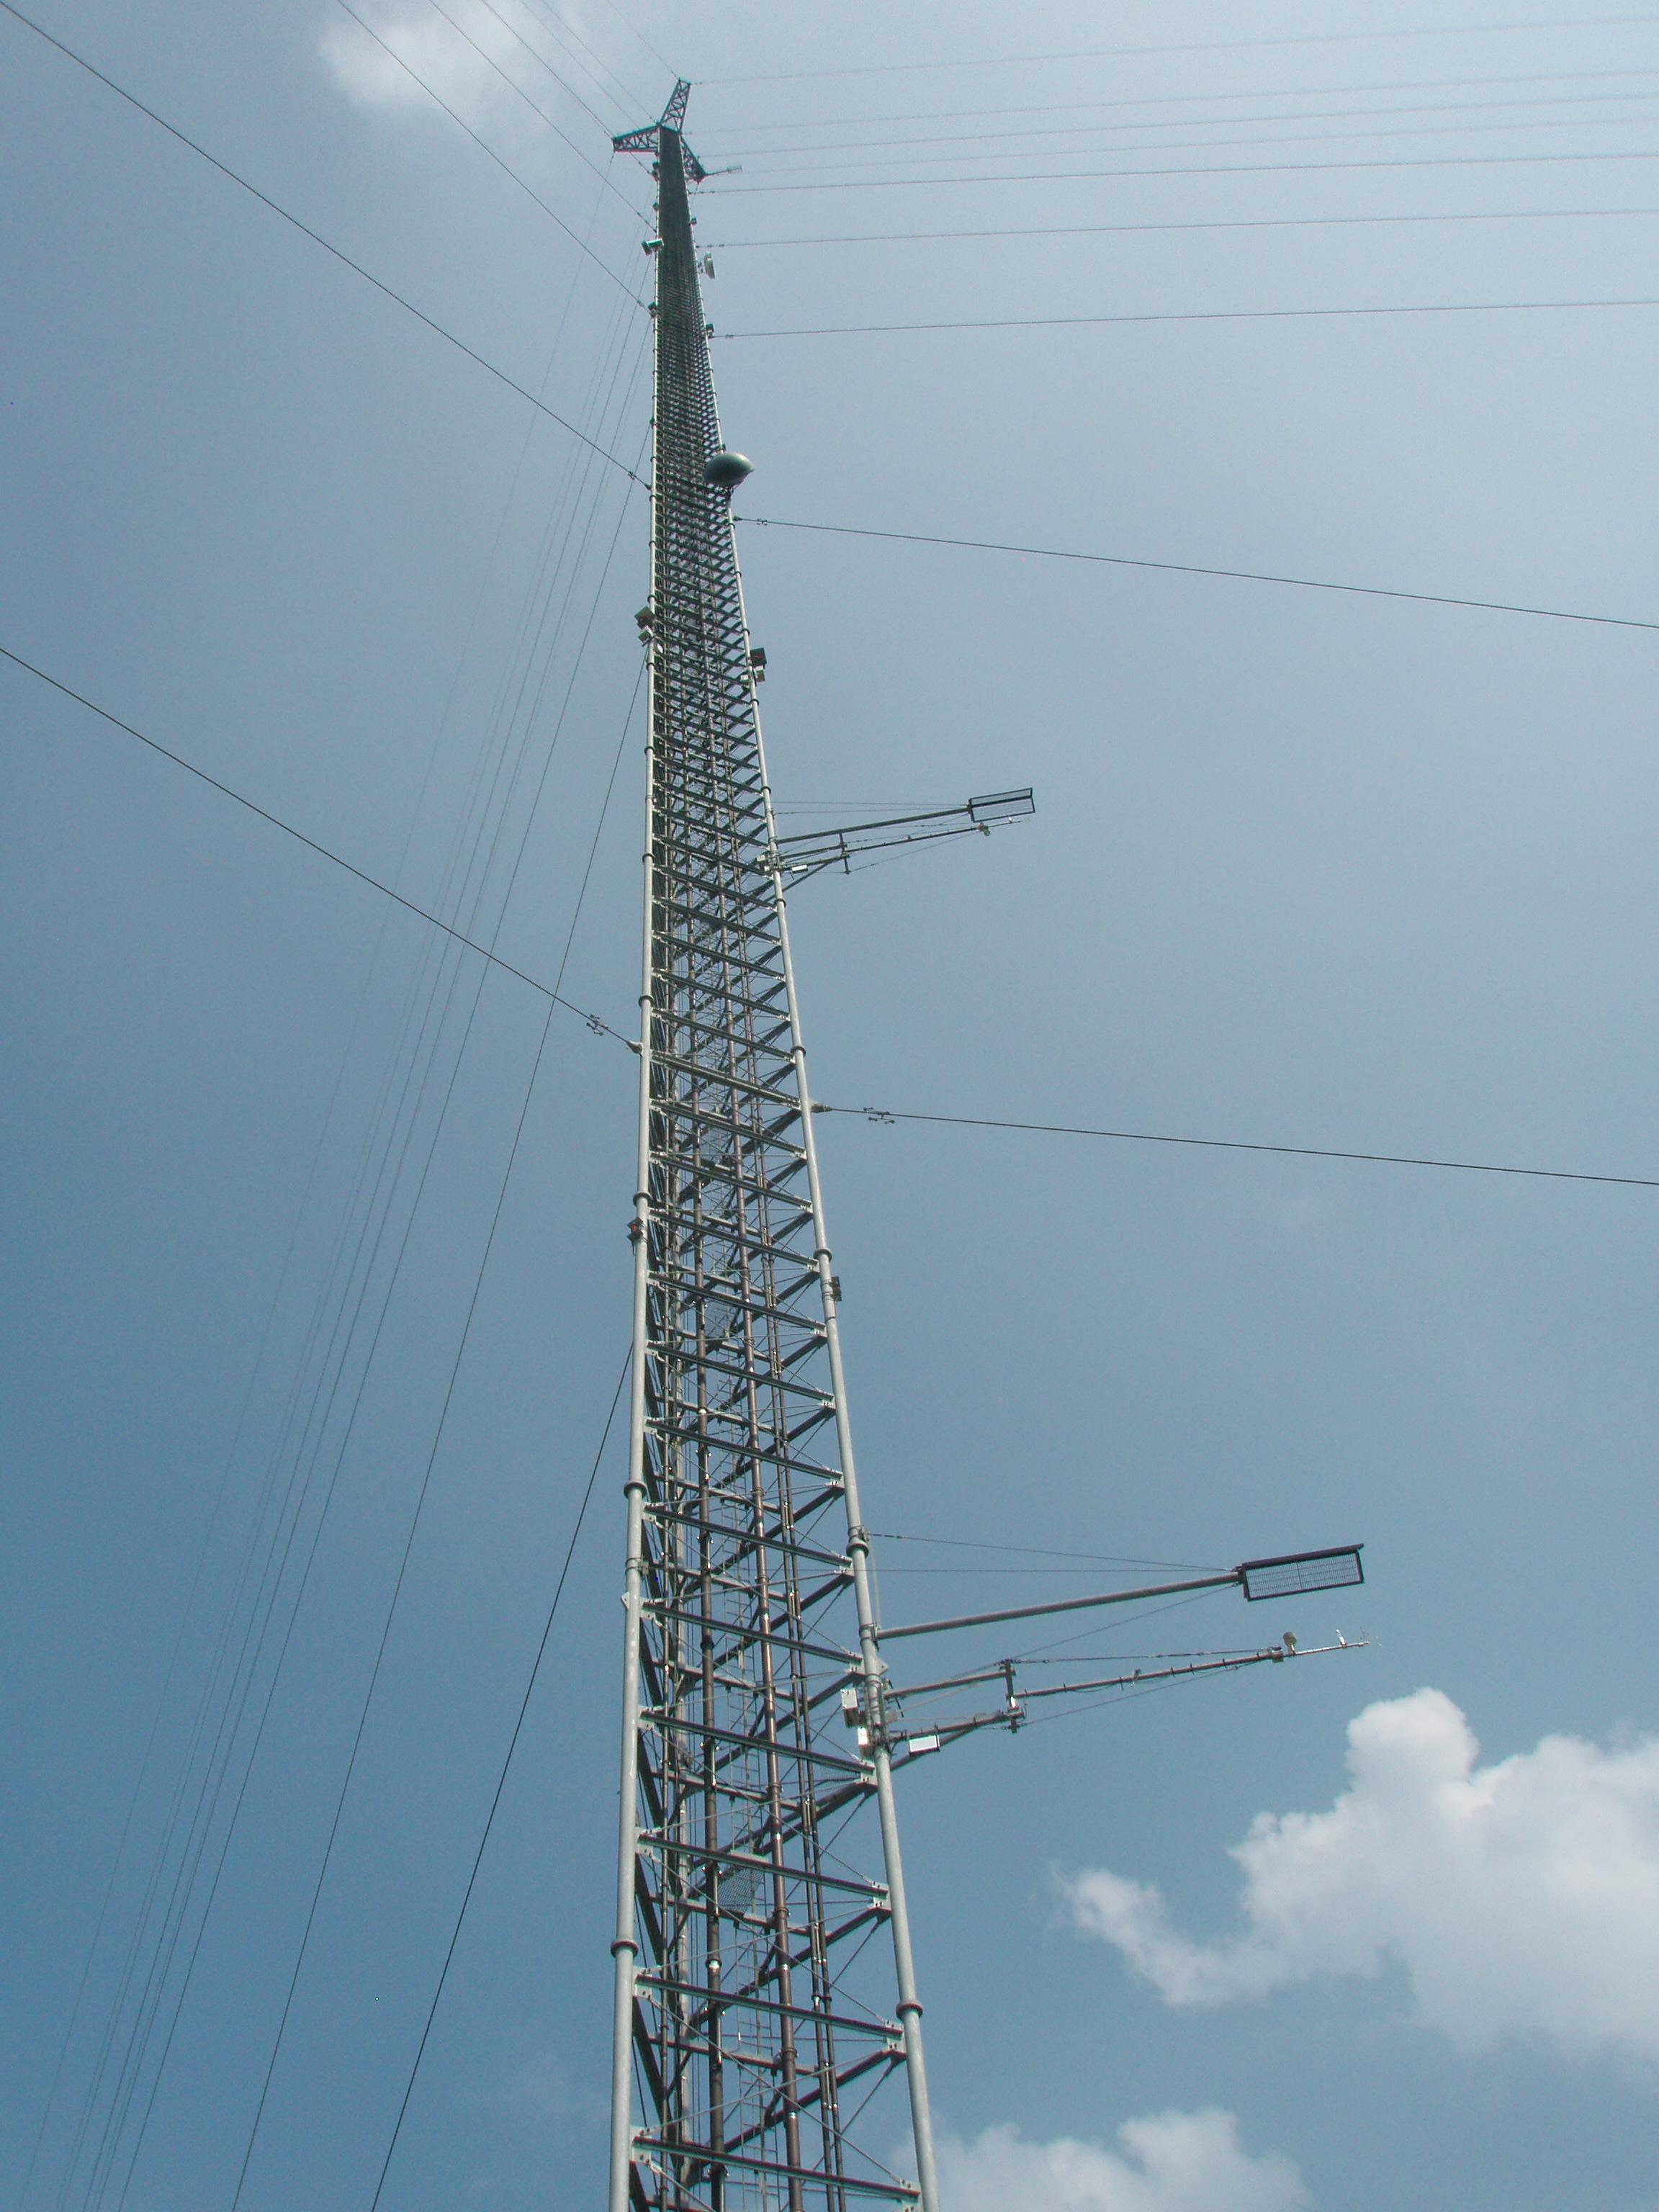 Esrl Global Monitoring Division Global Greenhouse Gas